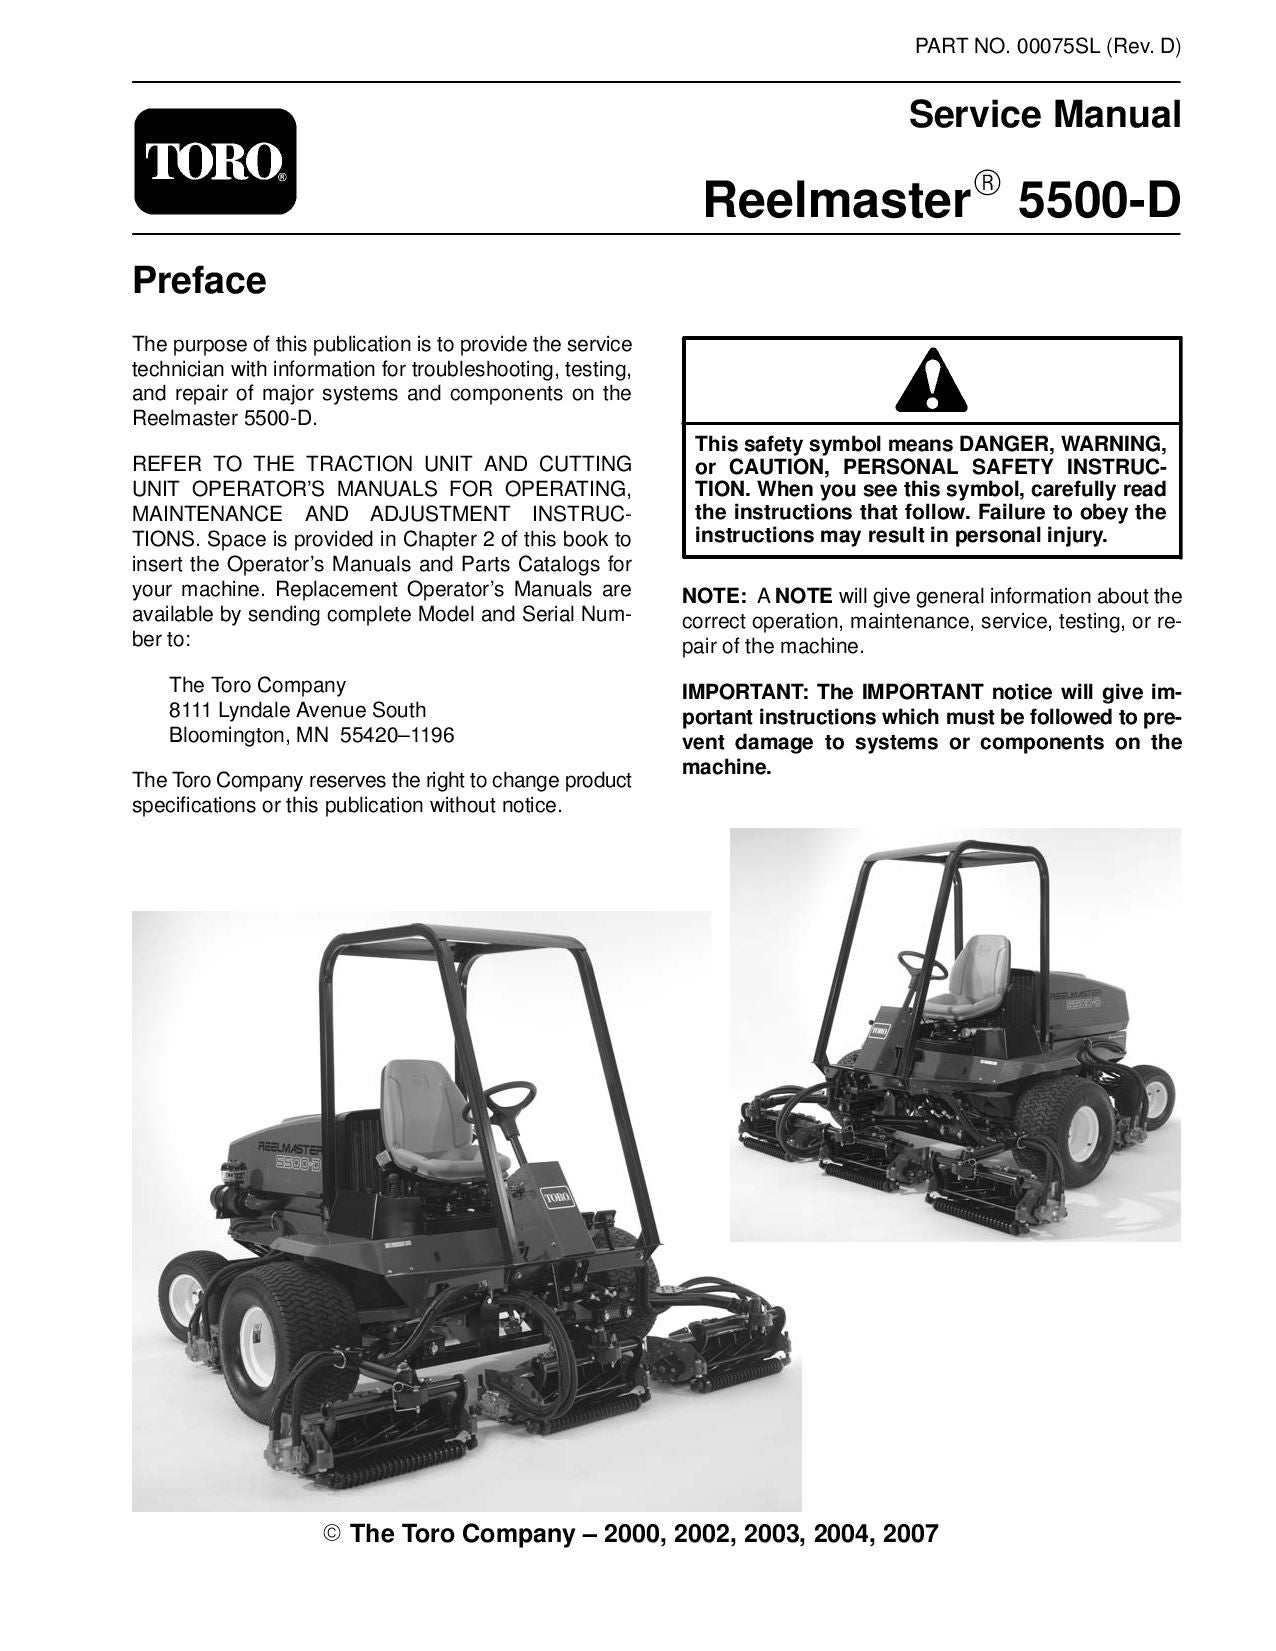 00075sl.pdf Reelmaster 5500-D (Rev D) Dec, 2007 by negimachi negimachi -  issuu